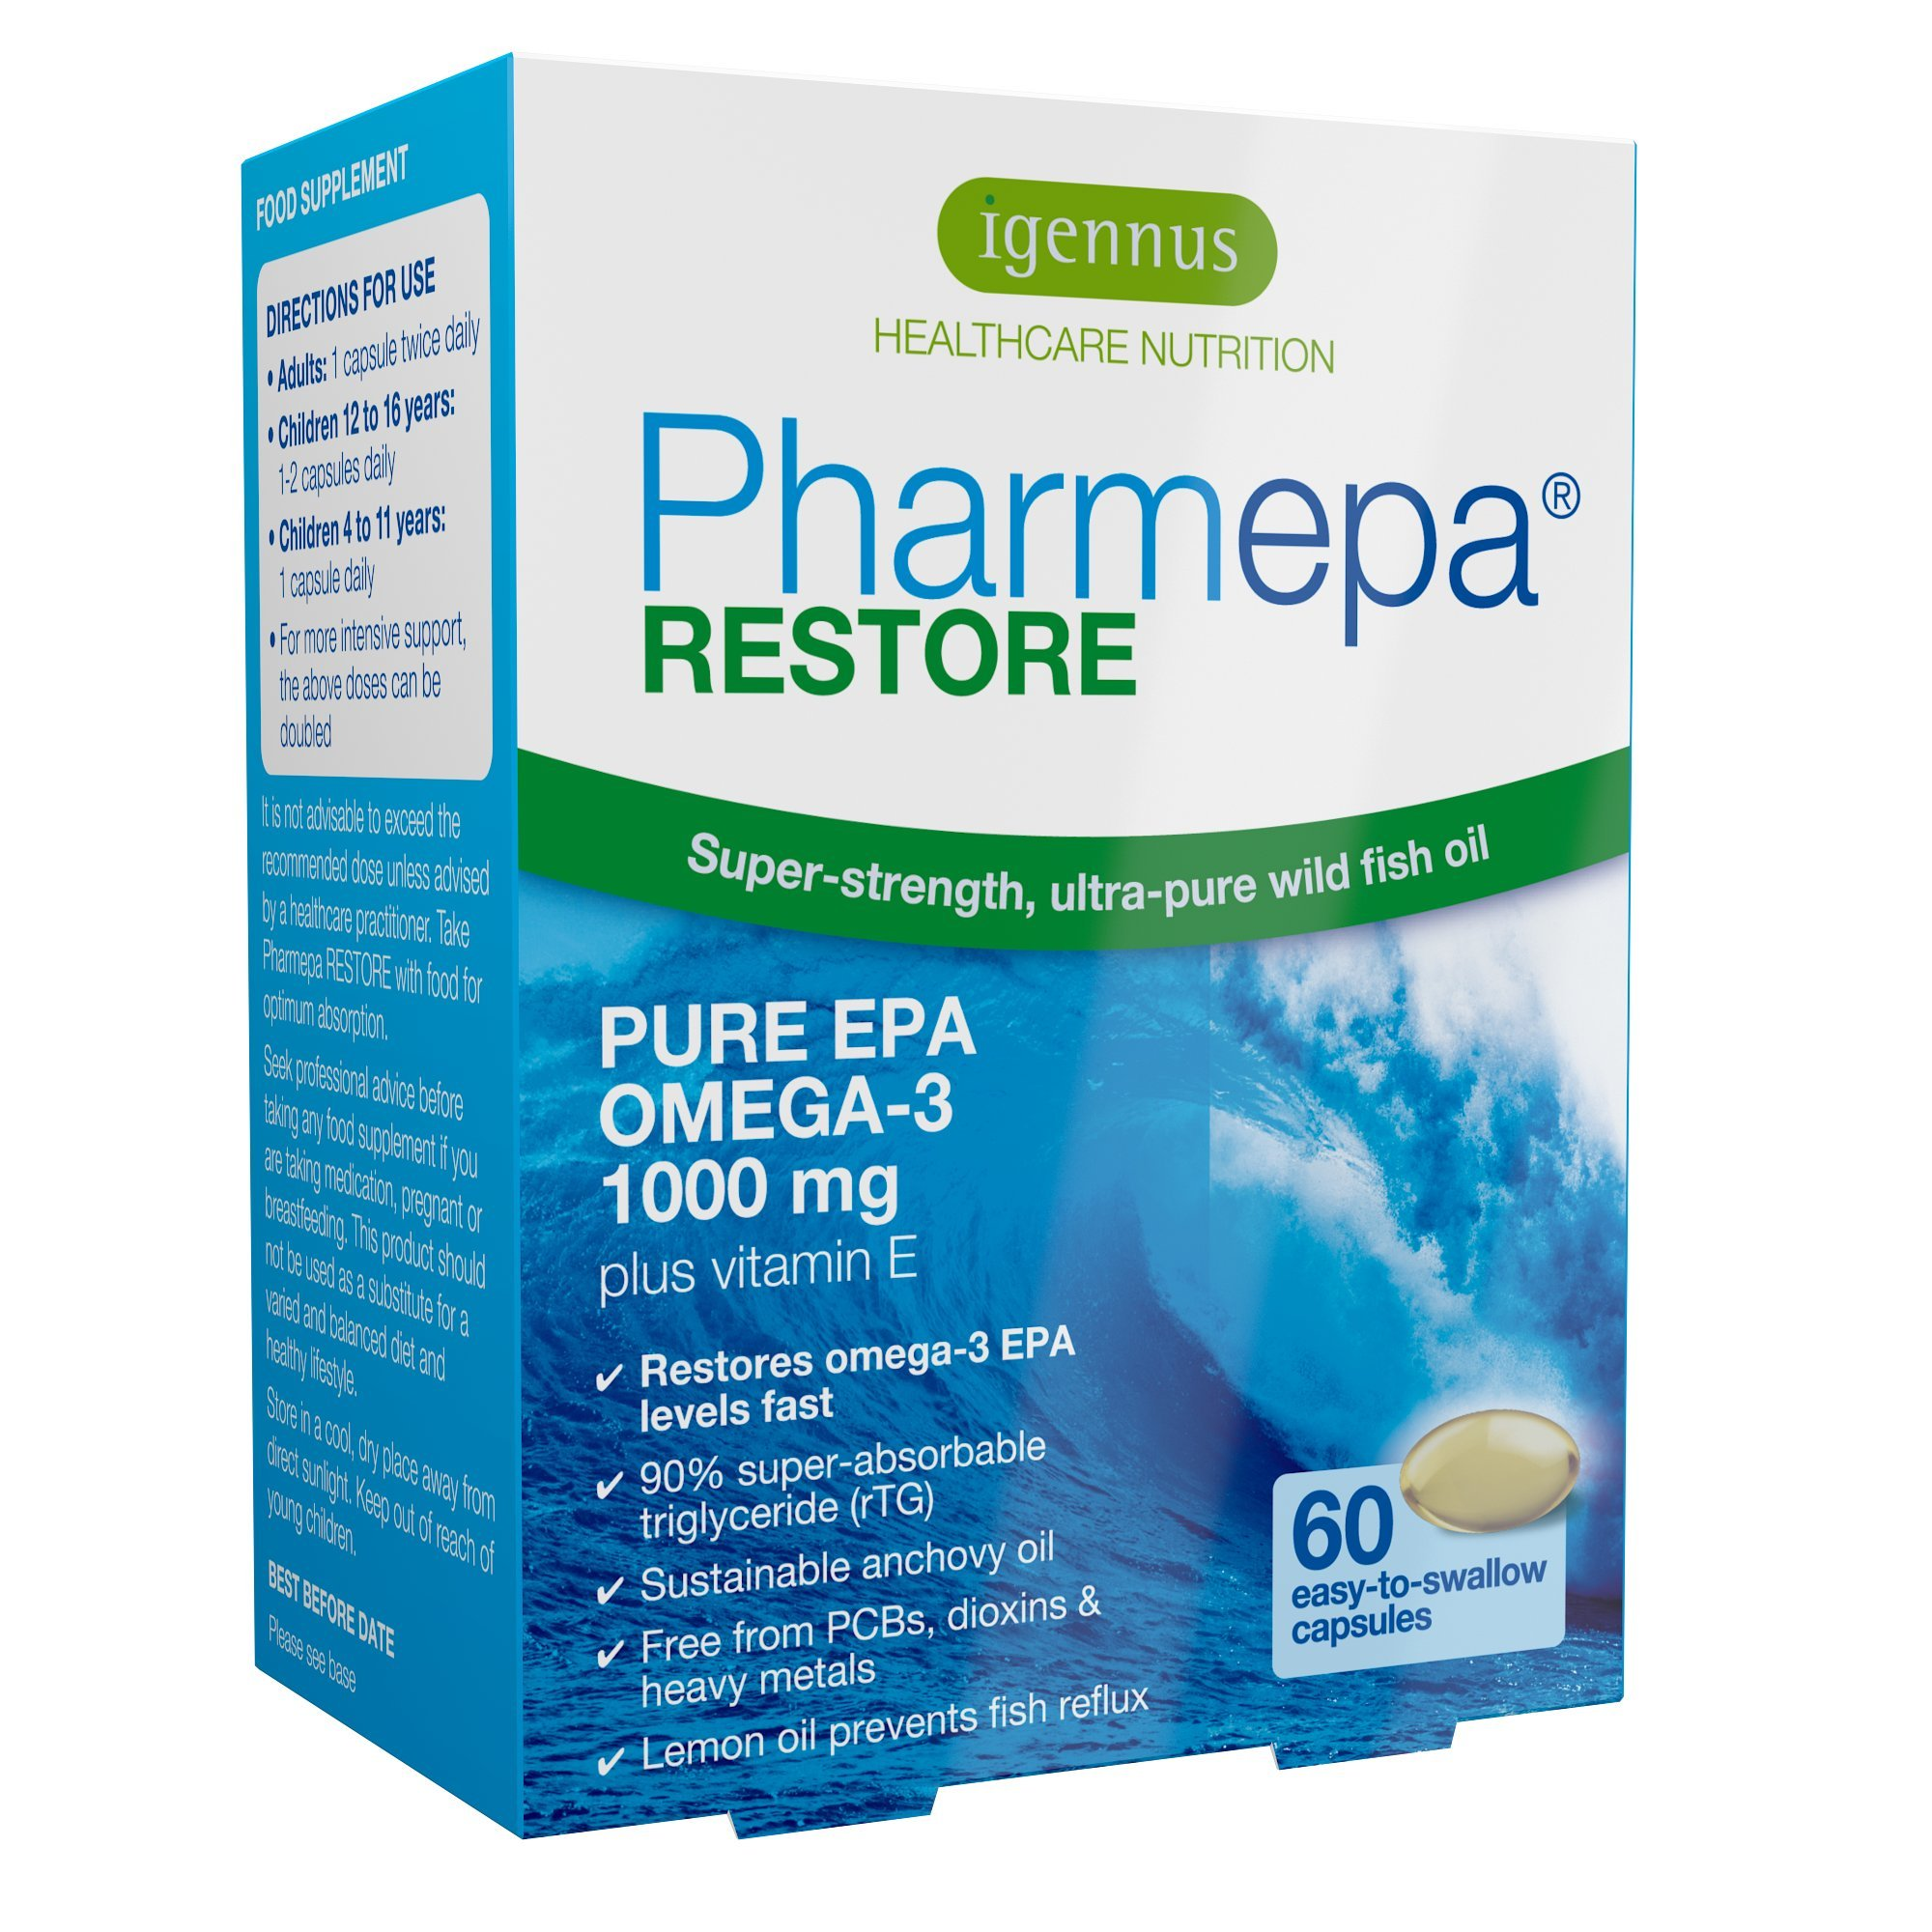 Pharmepa Restore Pure EPA Omega-3 Fish Oil, 1000mg EPA per Serving, Mood & Heart, 60 softgels